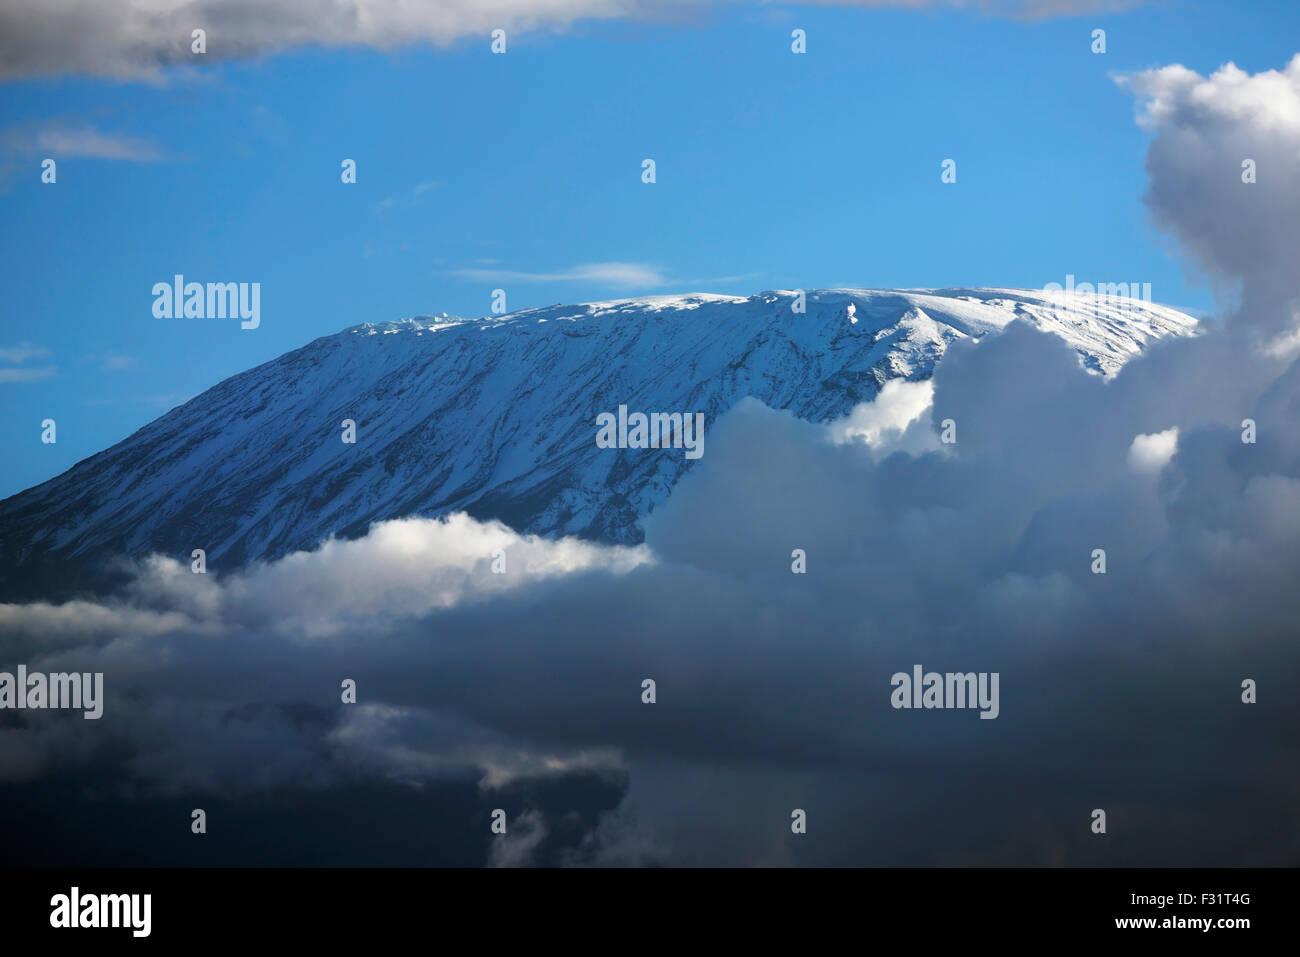 Kibo summit or Uhuru Peak of Mount Kilimanjaro, iced over, Amboseli, Kenya - Stock Image